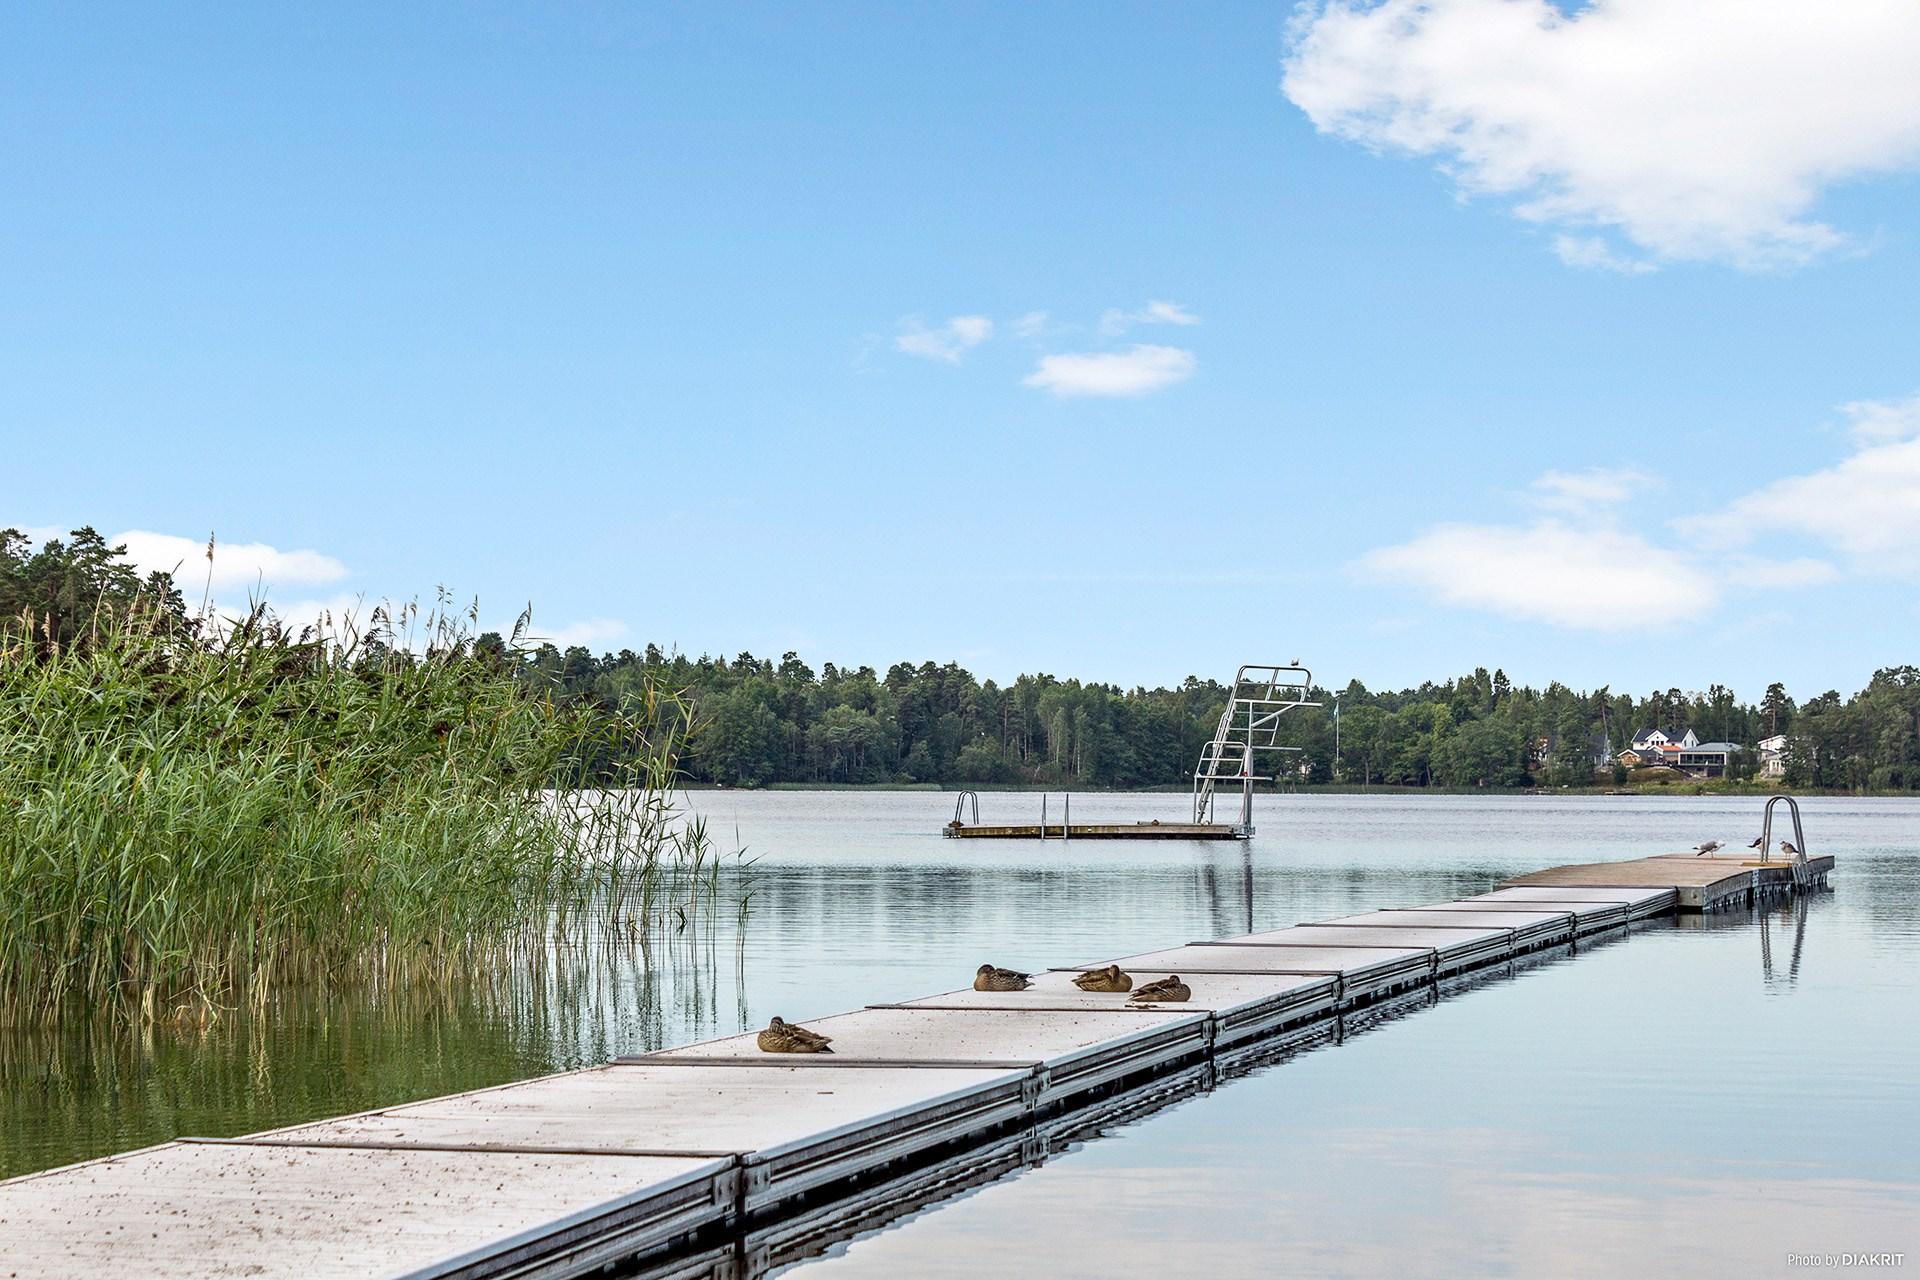 Lillsjöns bad